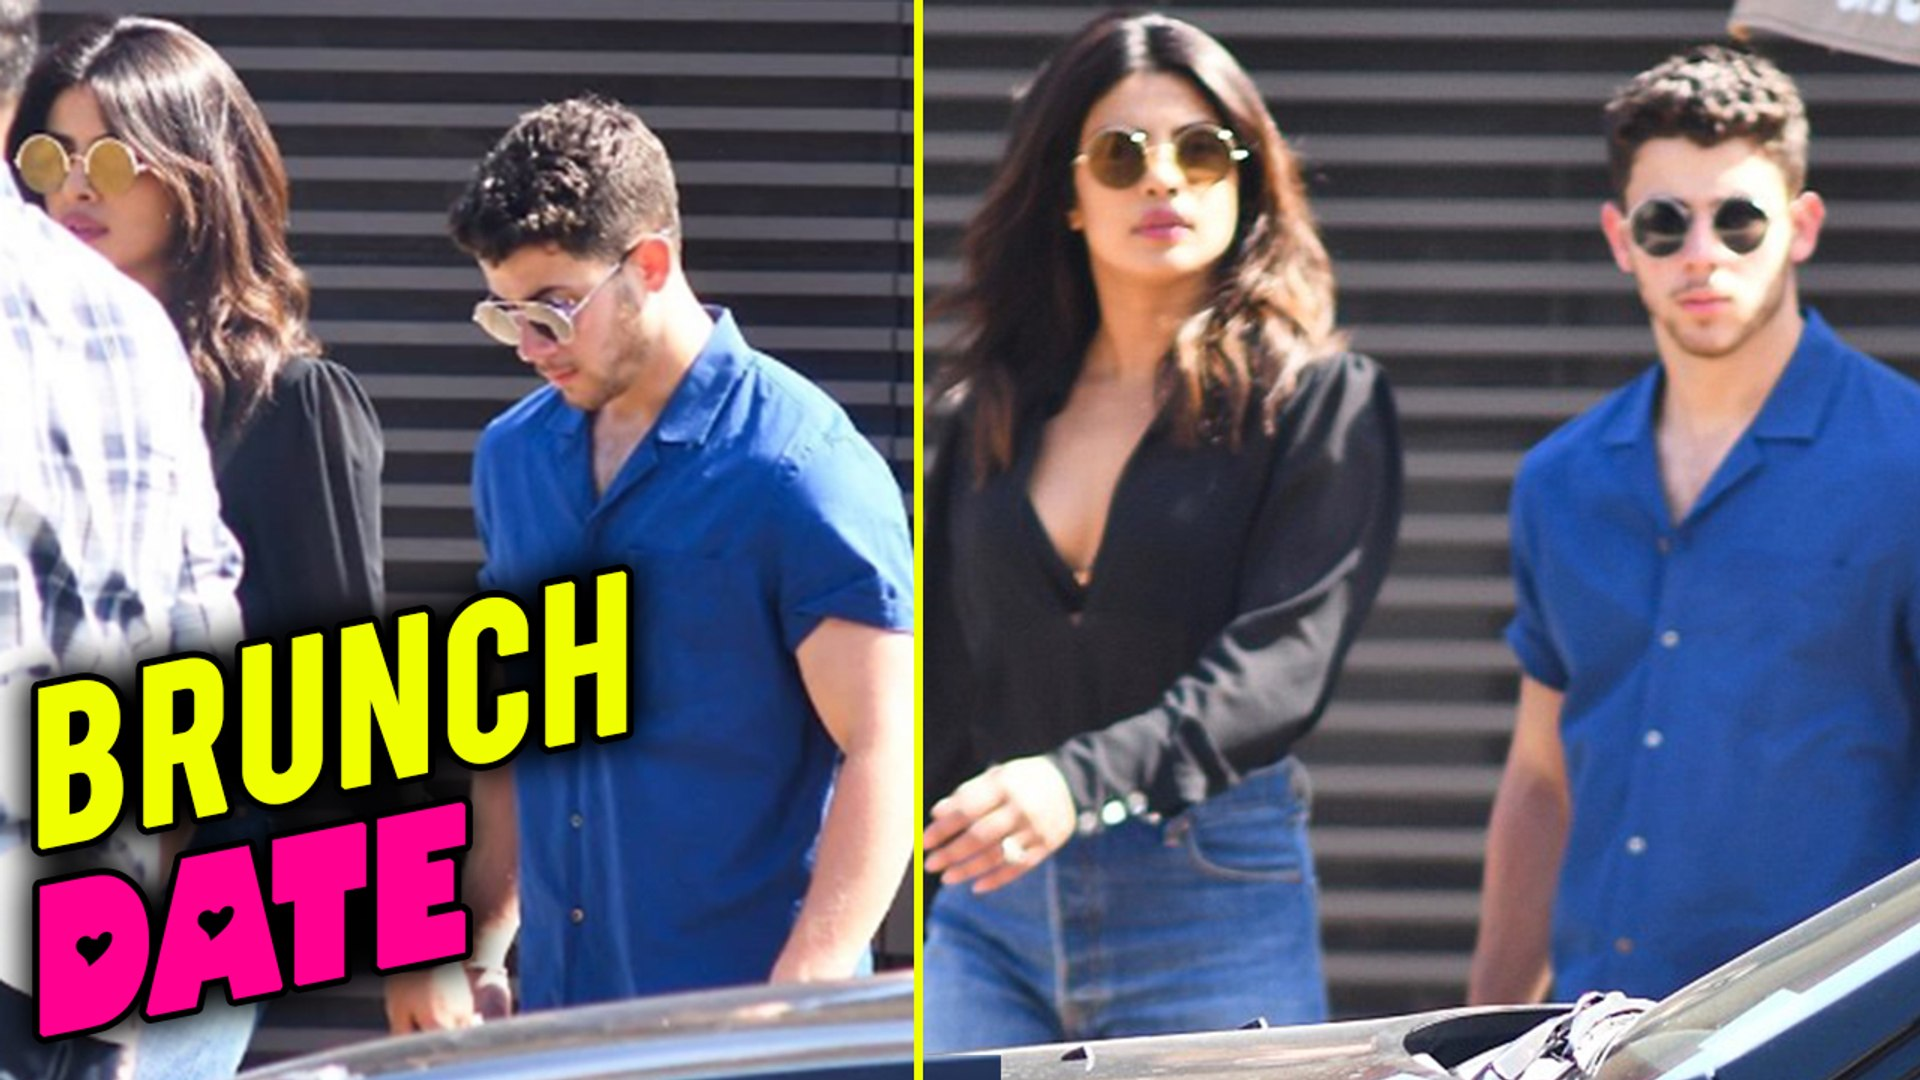 Priyanka Chopra and Nick Jonas Meet Over A Brunch Date In Malibu, US